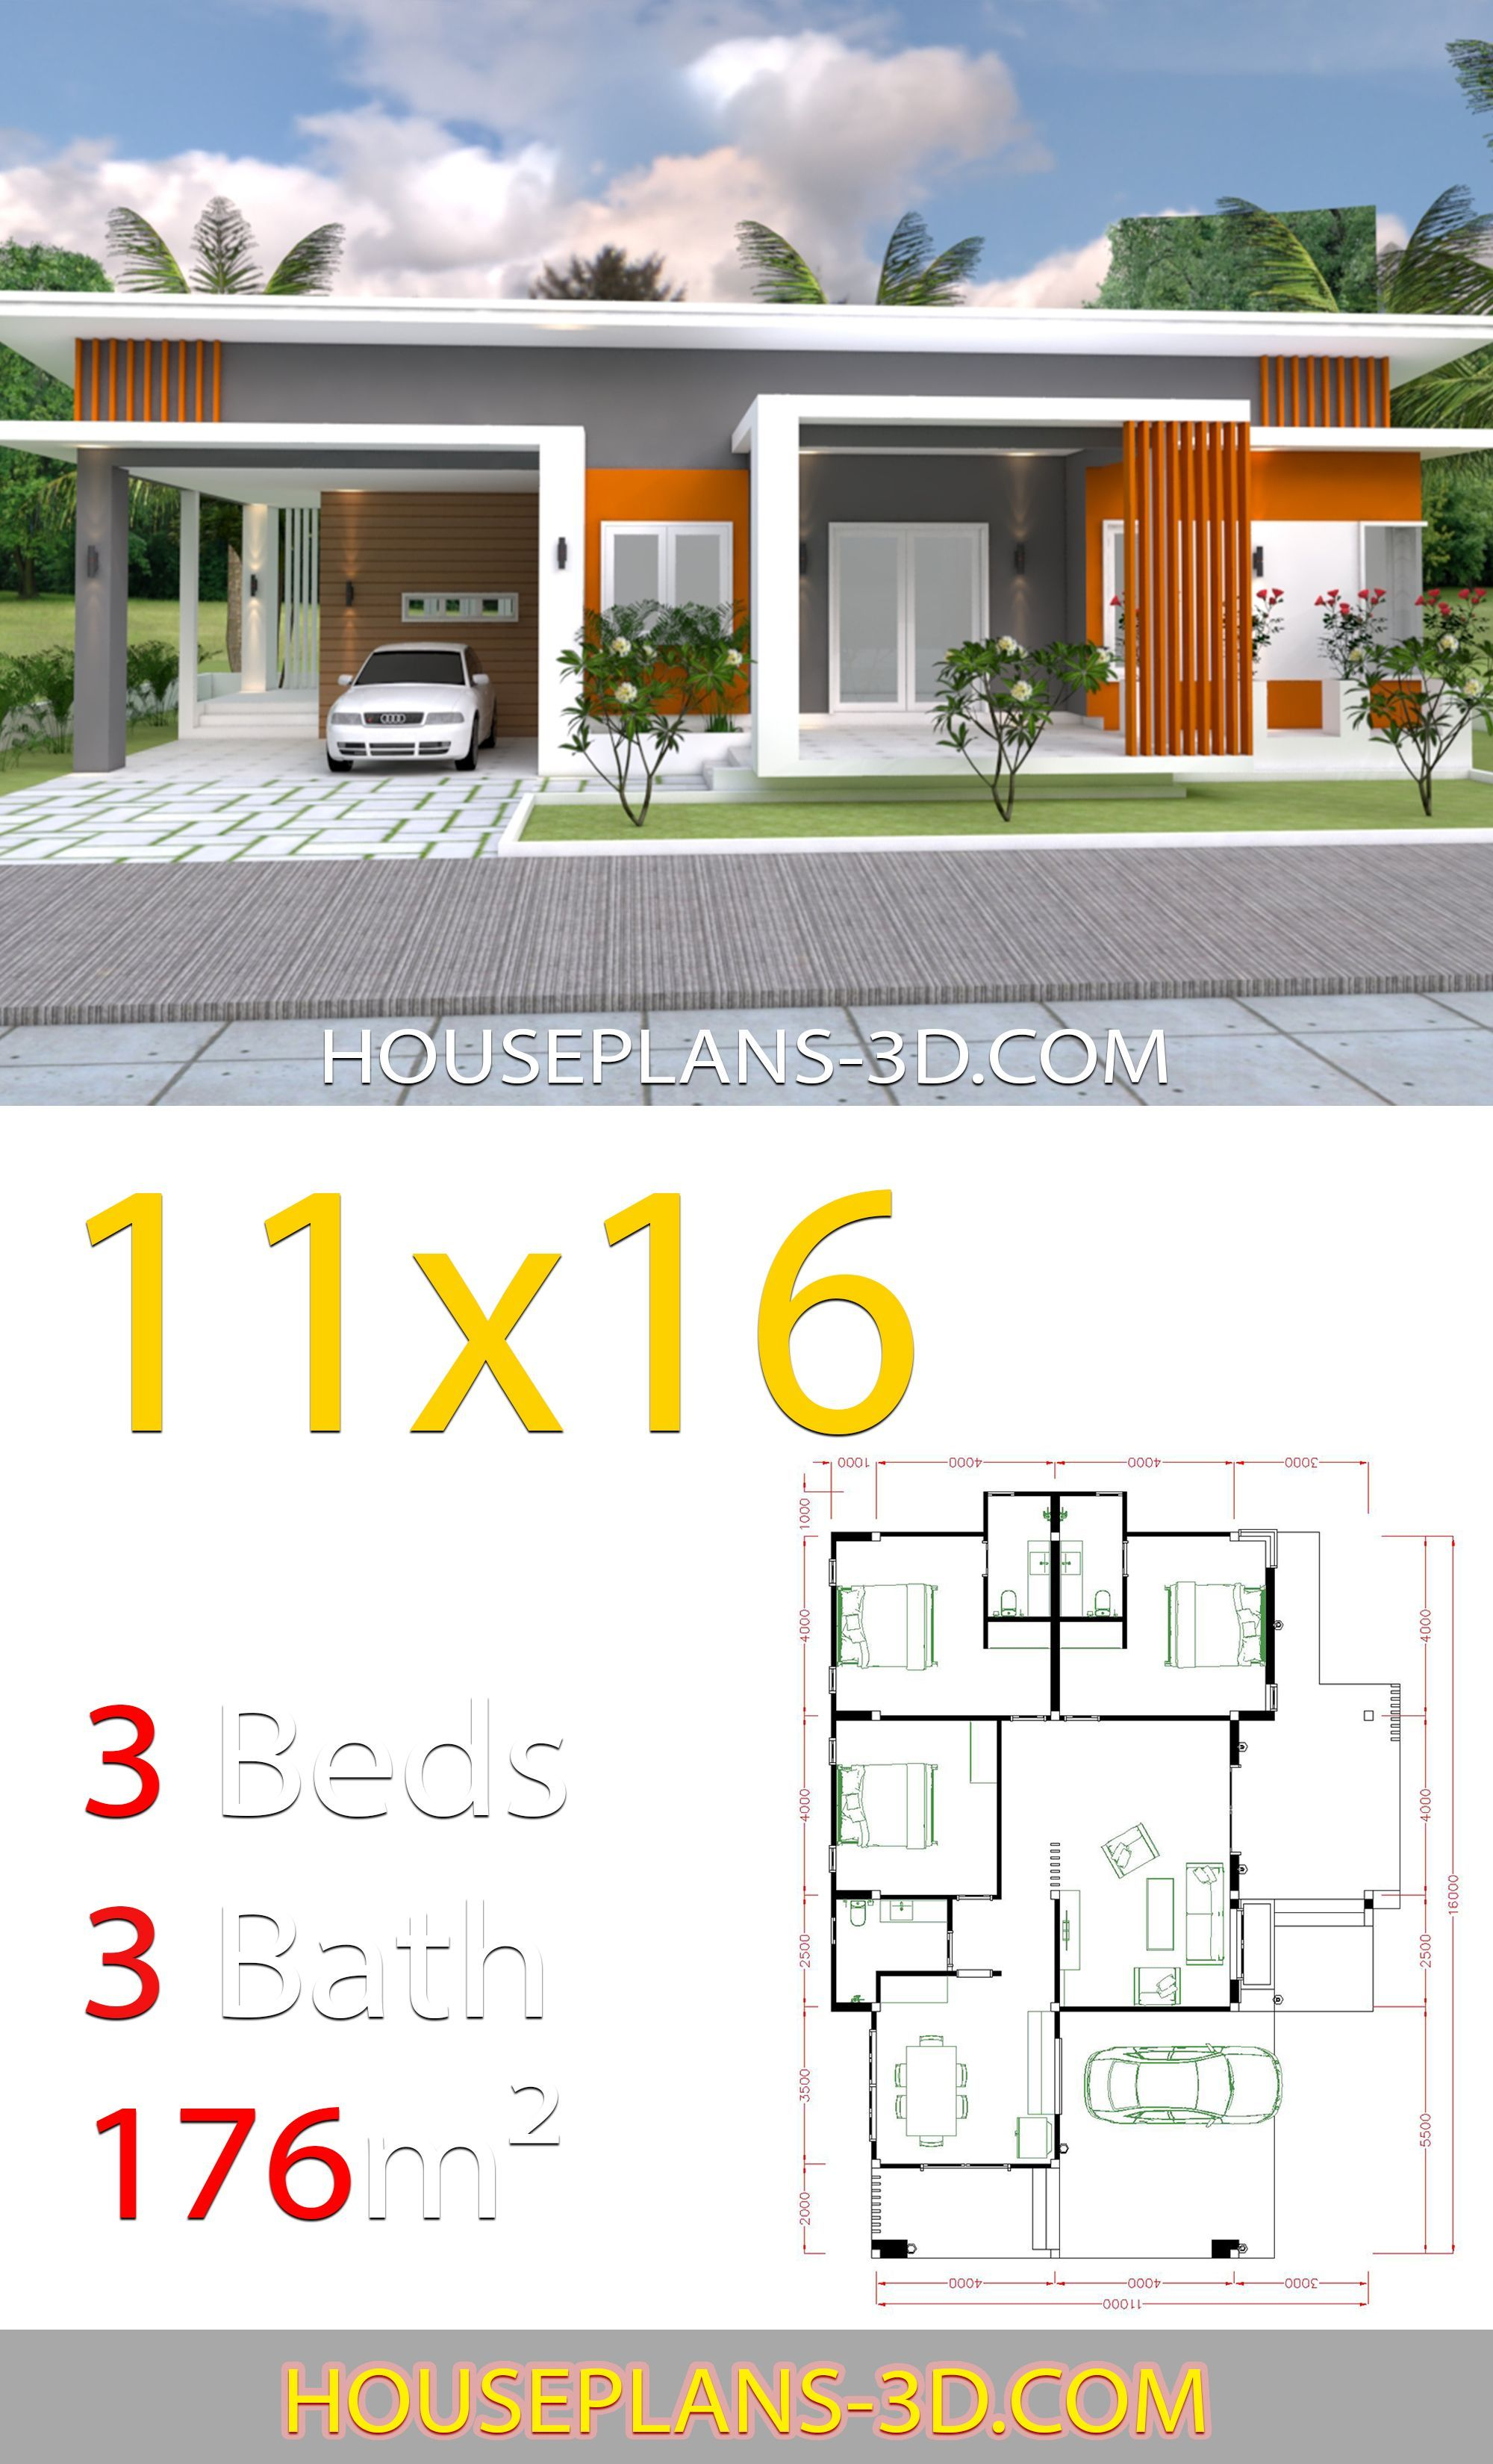 House Plans Bungalow House Plans Bungalow House Design Small House Design Plans Modern Arsitektur Desain Rumah Arsitektur Rumah